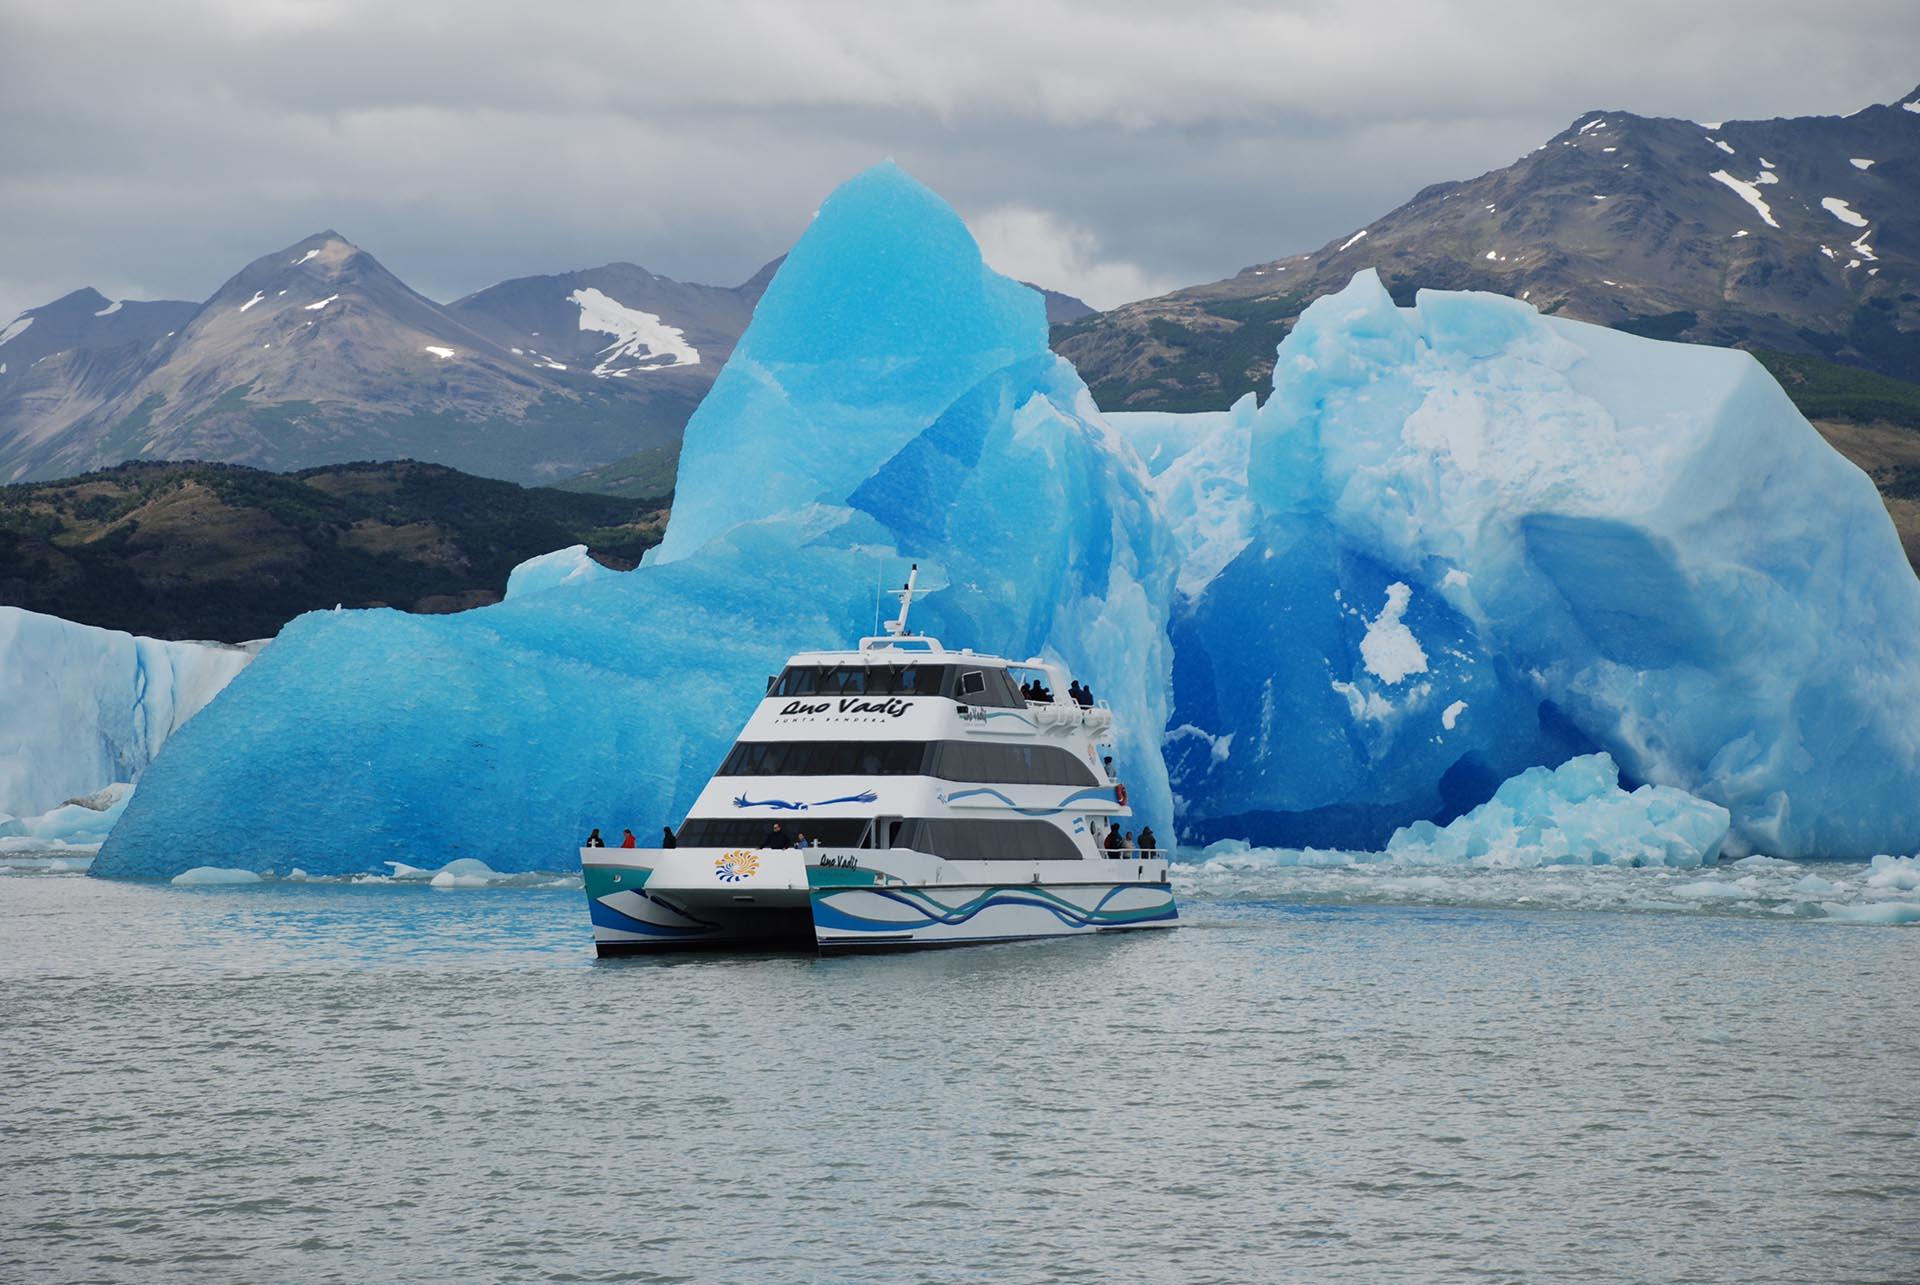 patagonia argentina siti patrimonio unesco parque los glaciares